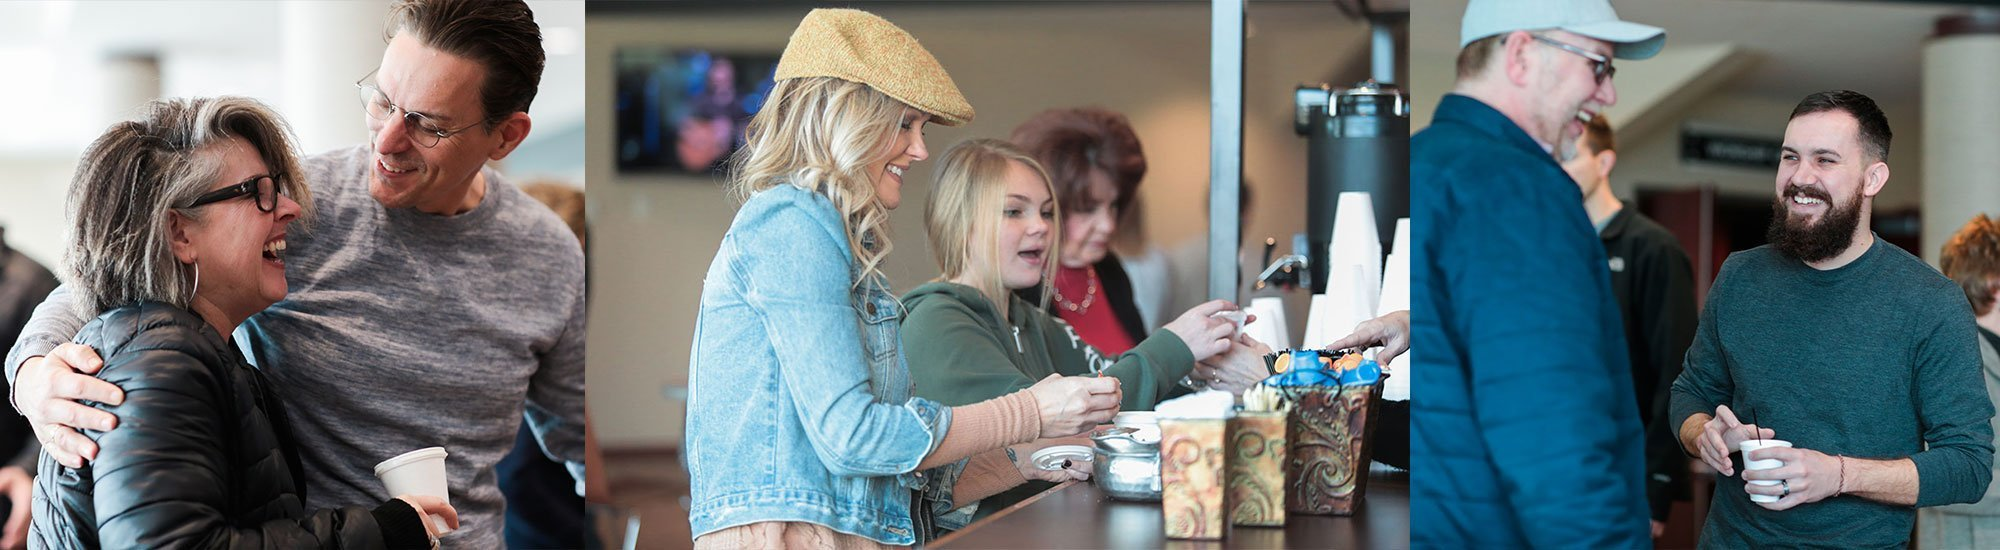 people drinking coffee at la croix